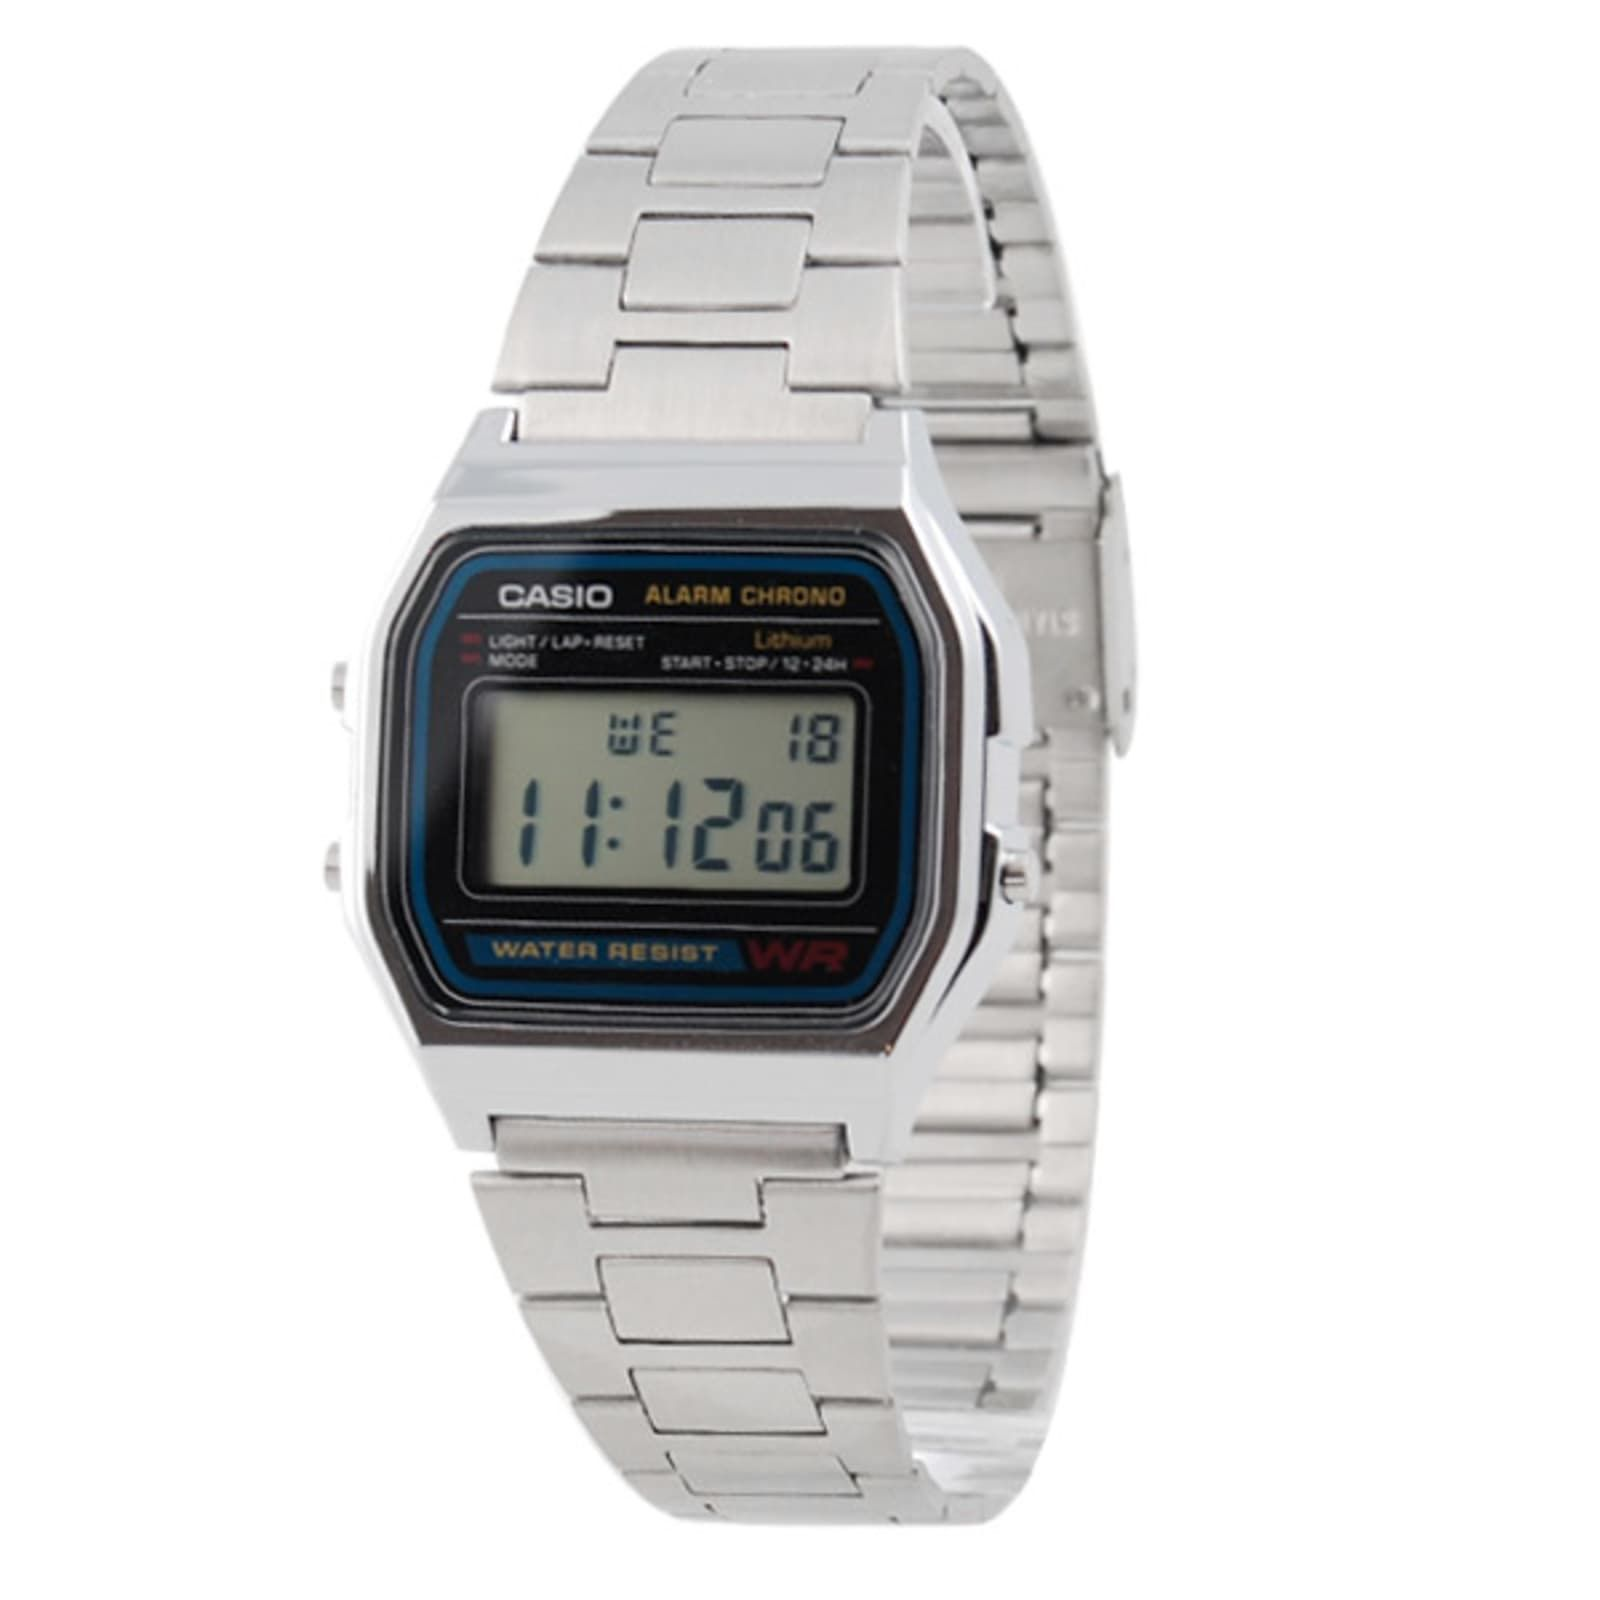 Retro Classic Watch Casio 365 Day Return Policy Sportswatches Retro Classic Watch 2020 Retro Watches Ve Mavi